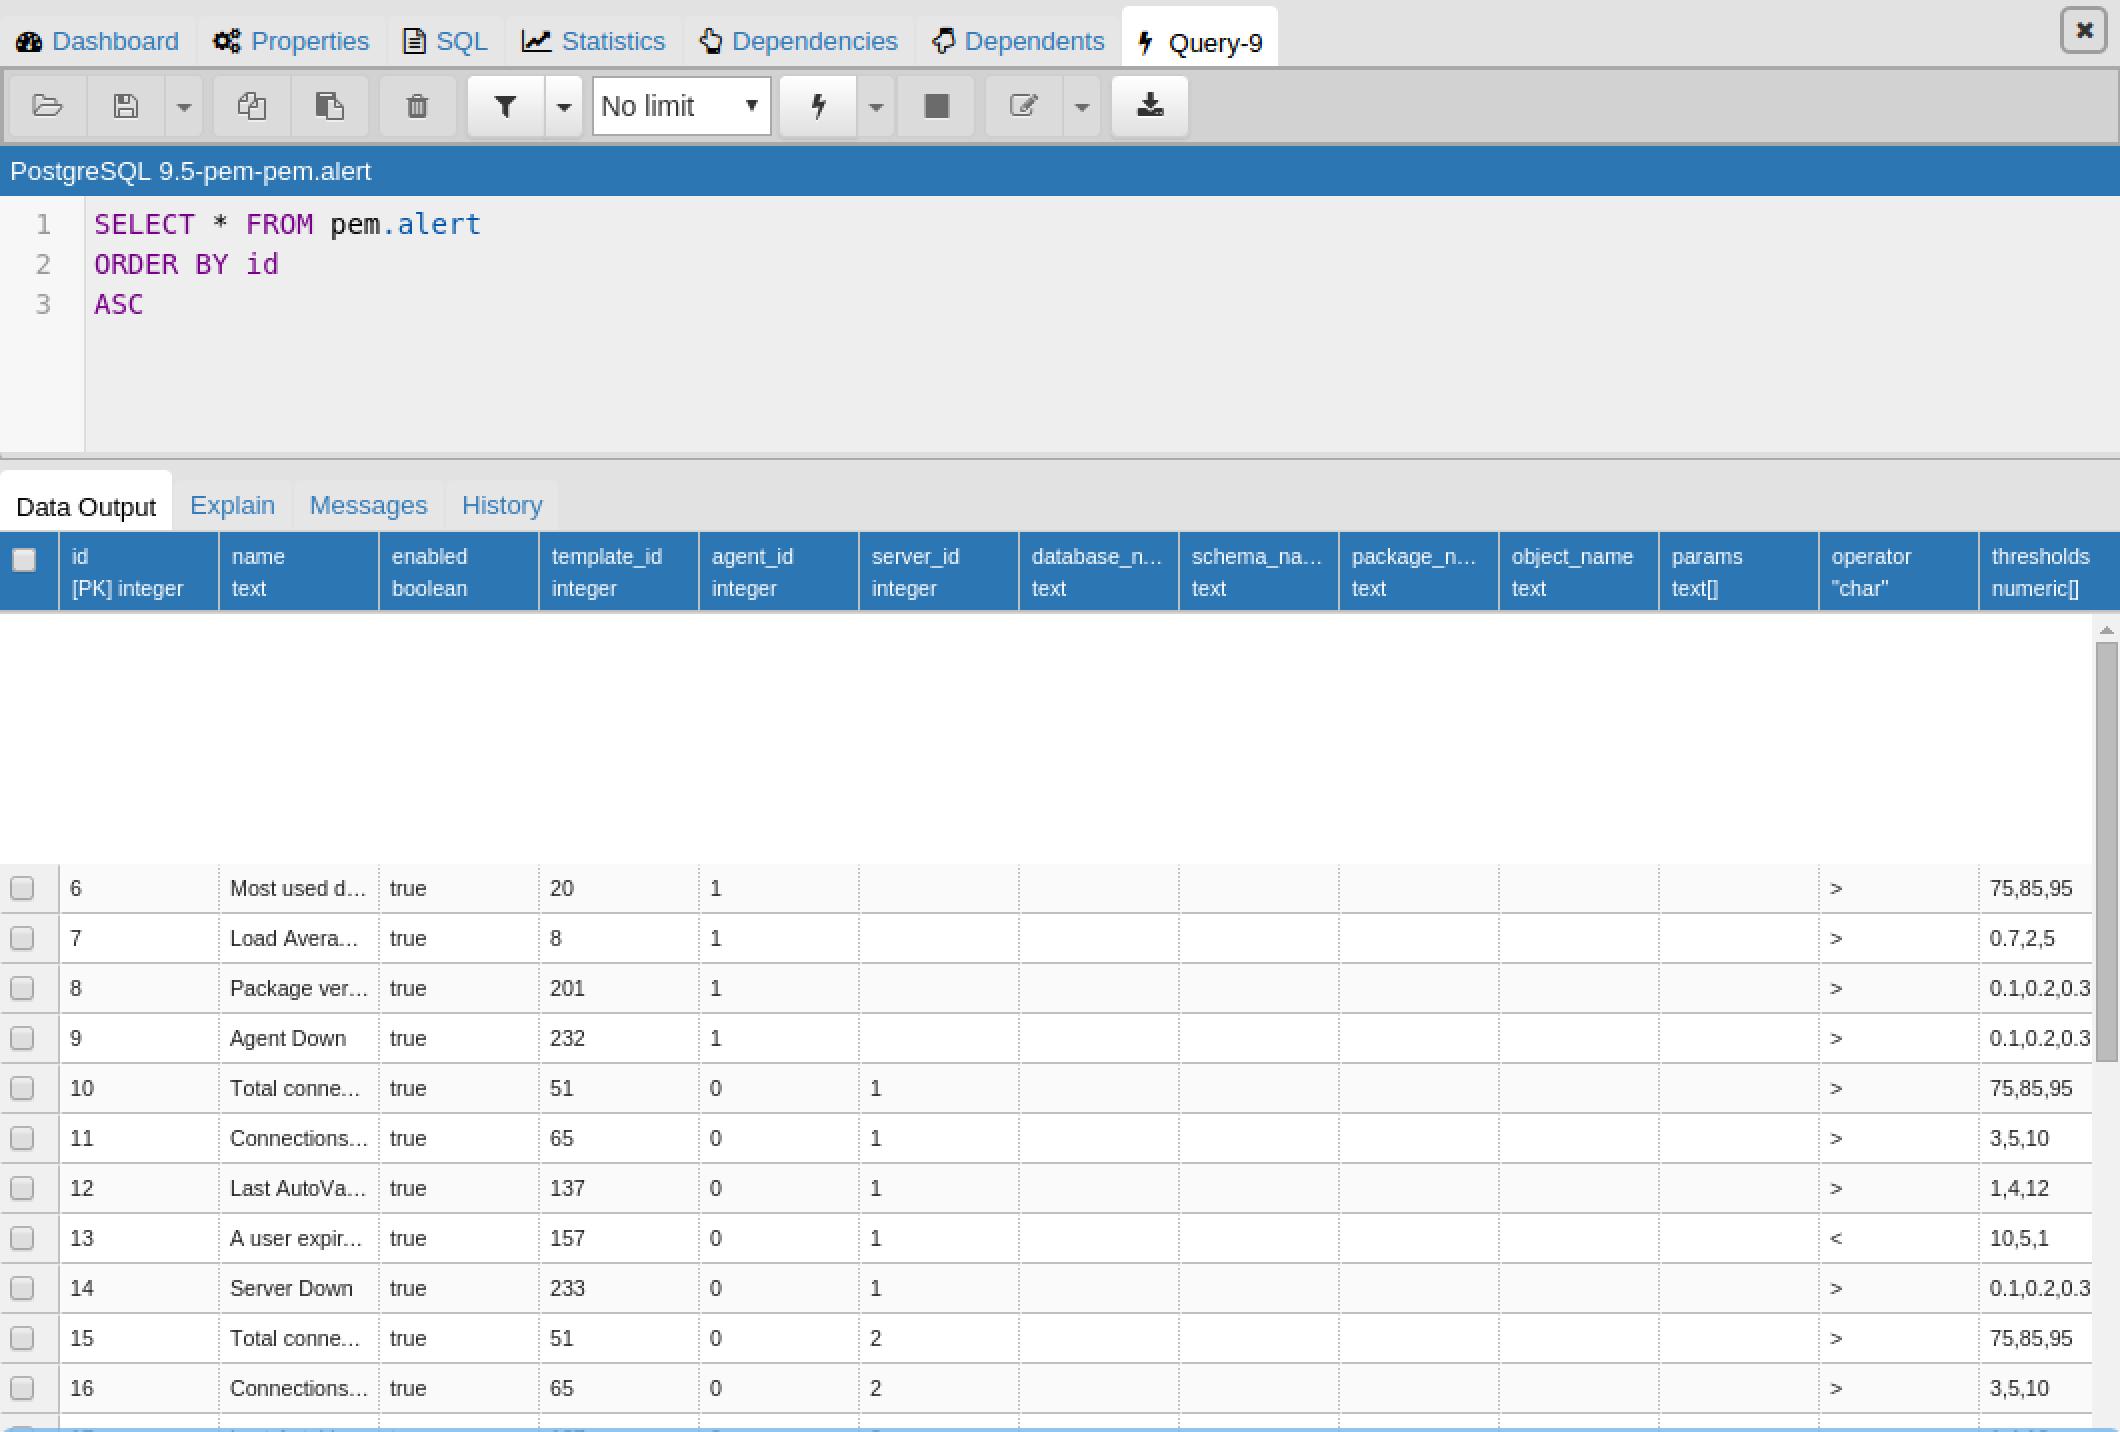 PostgreSQL: Re: PATCH: SlickGrid integration in query tool (pgAdmin4)